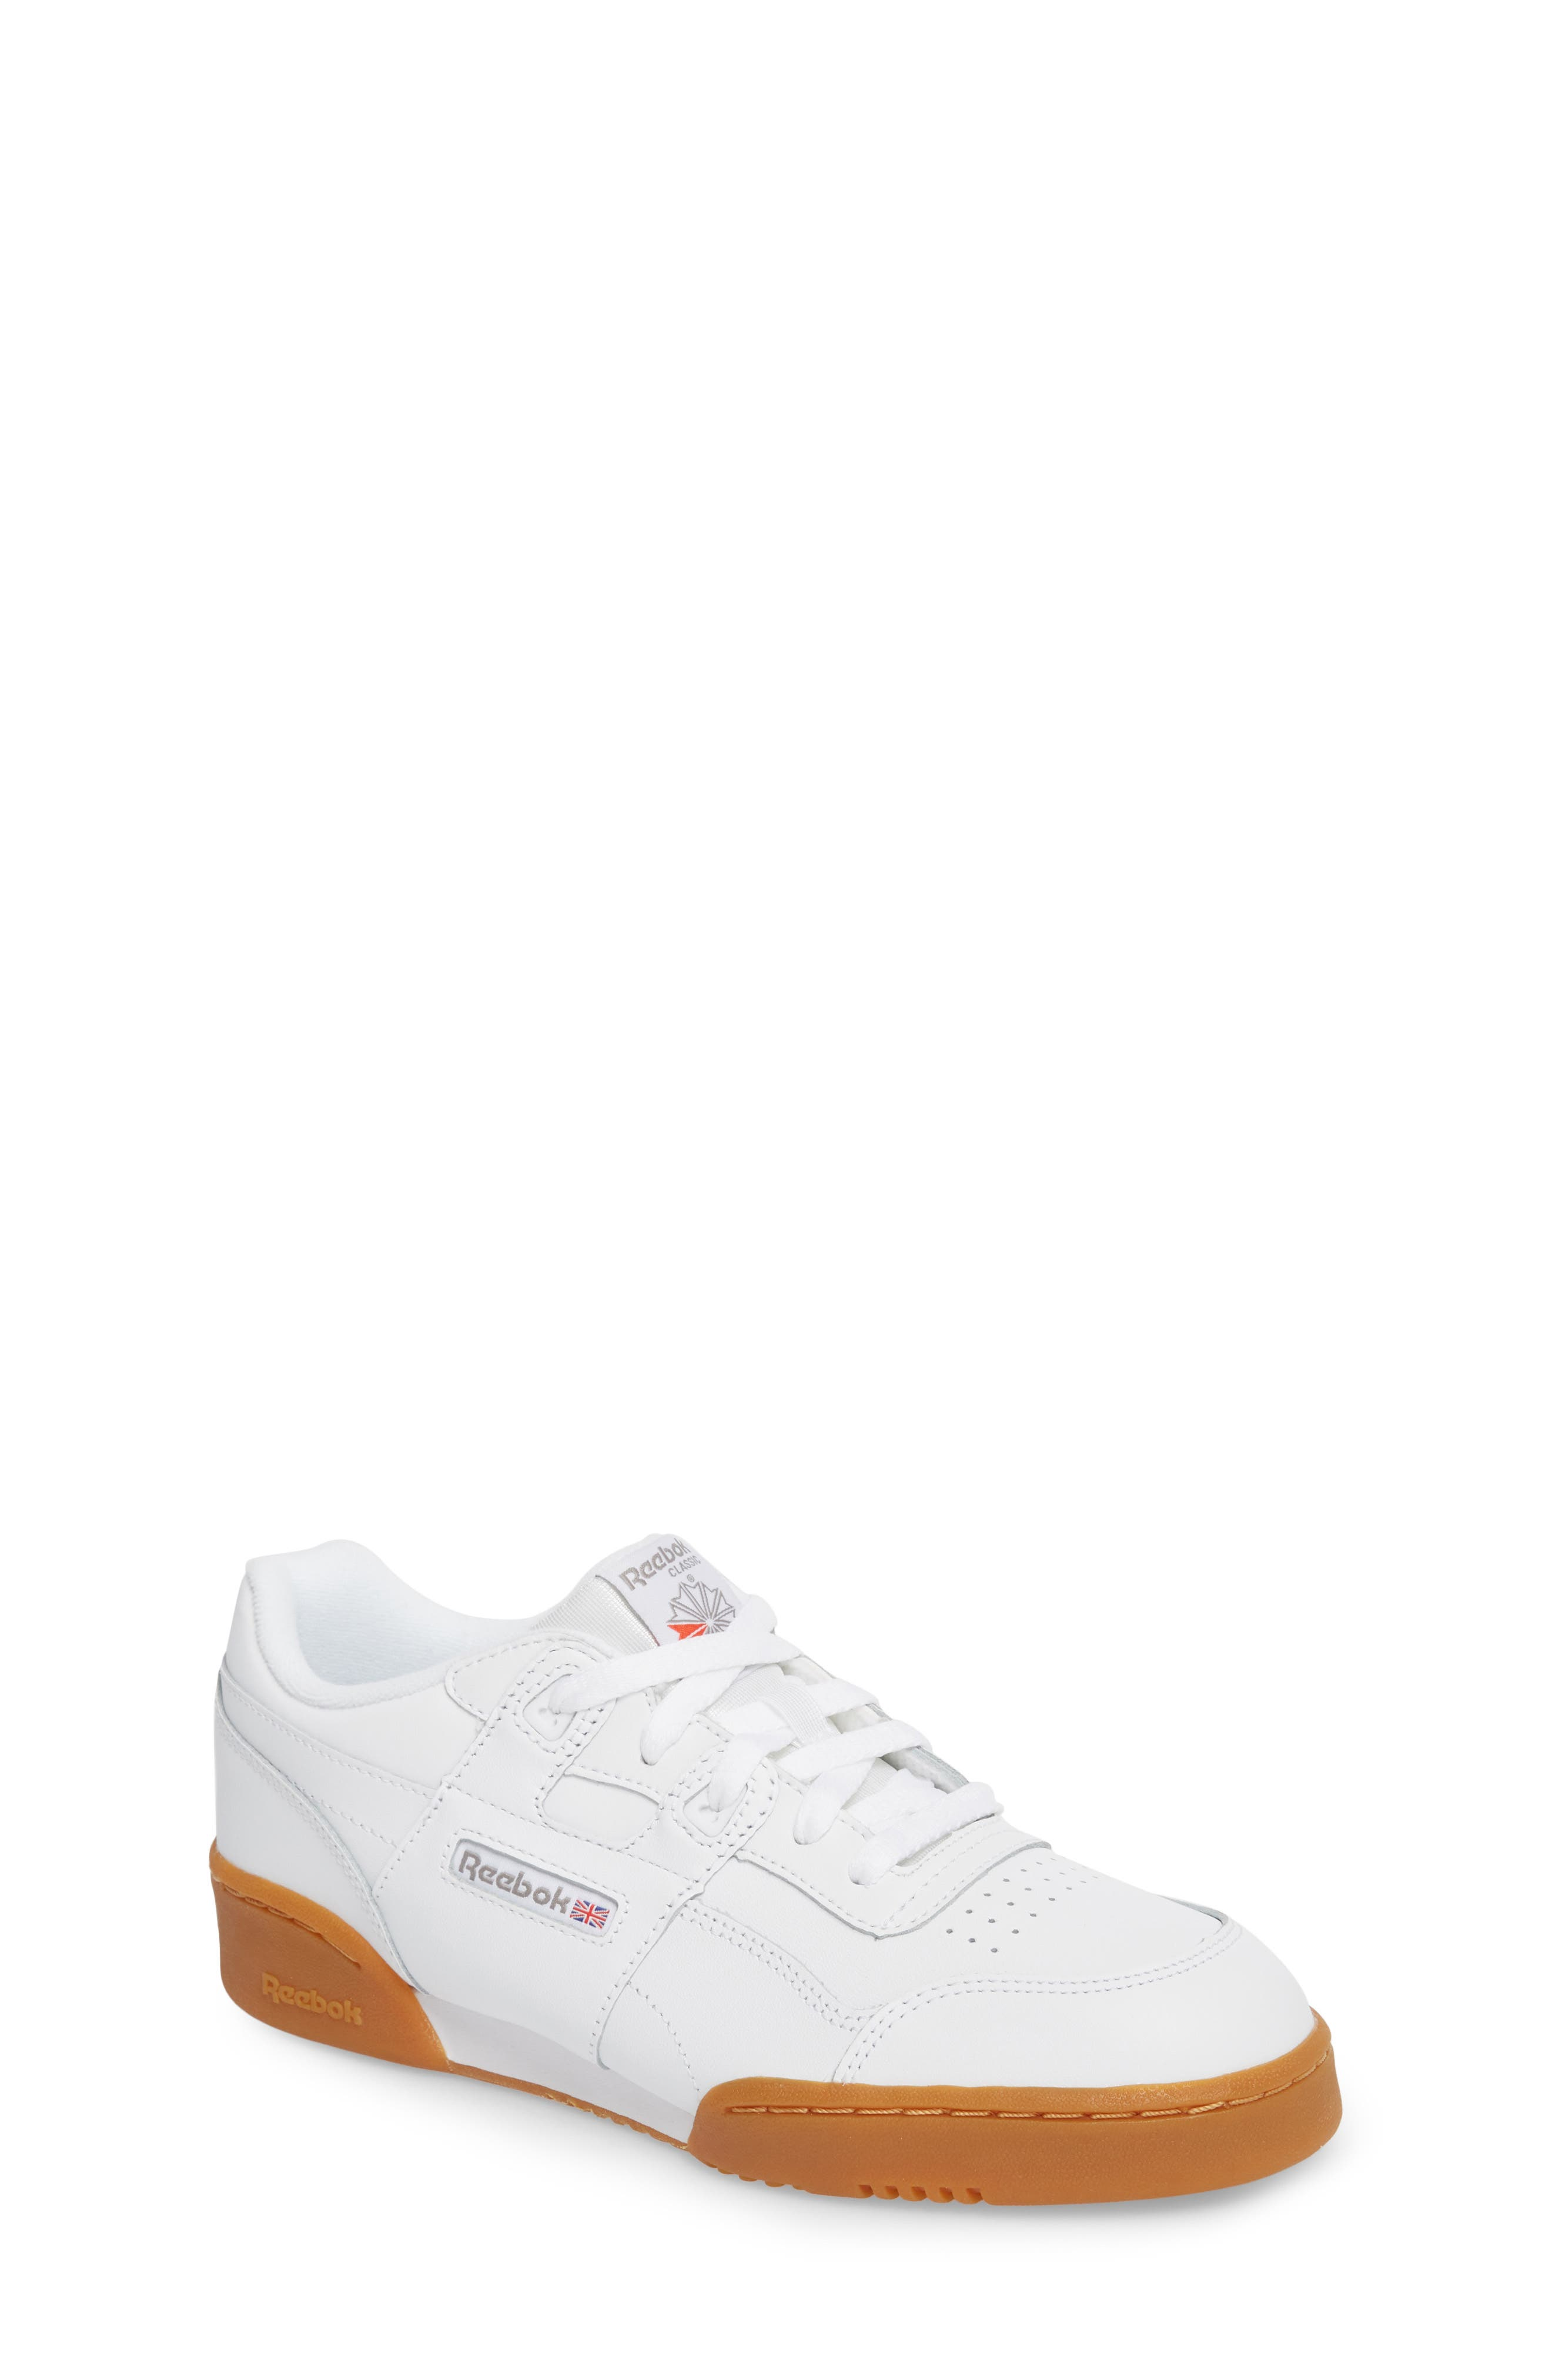 Workout Plus Sneaker,                             Main thumbnail 1, color,                             WHITE